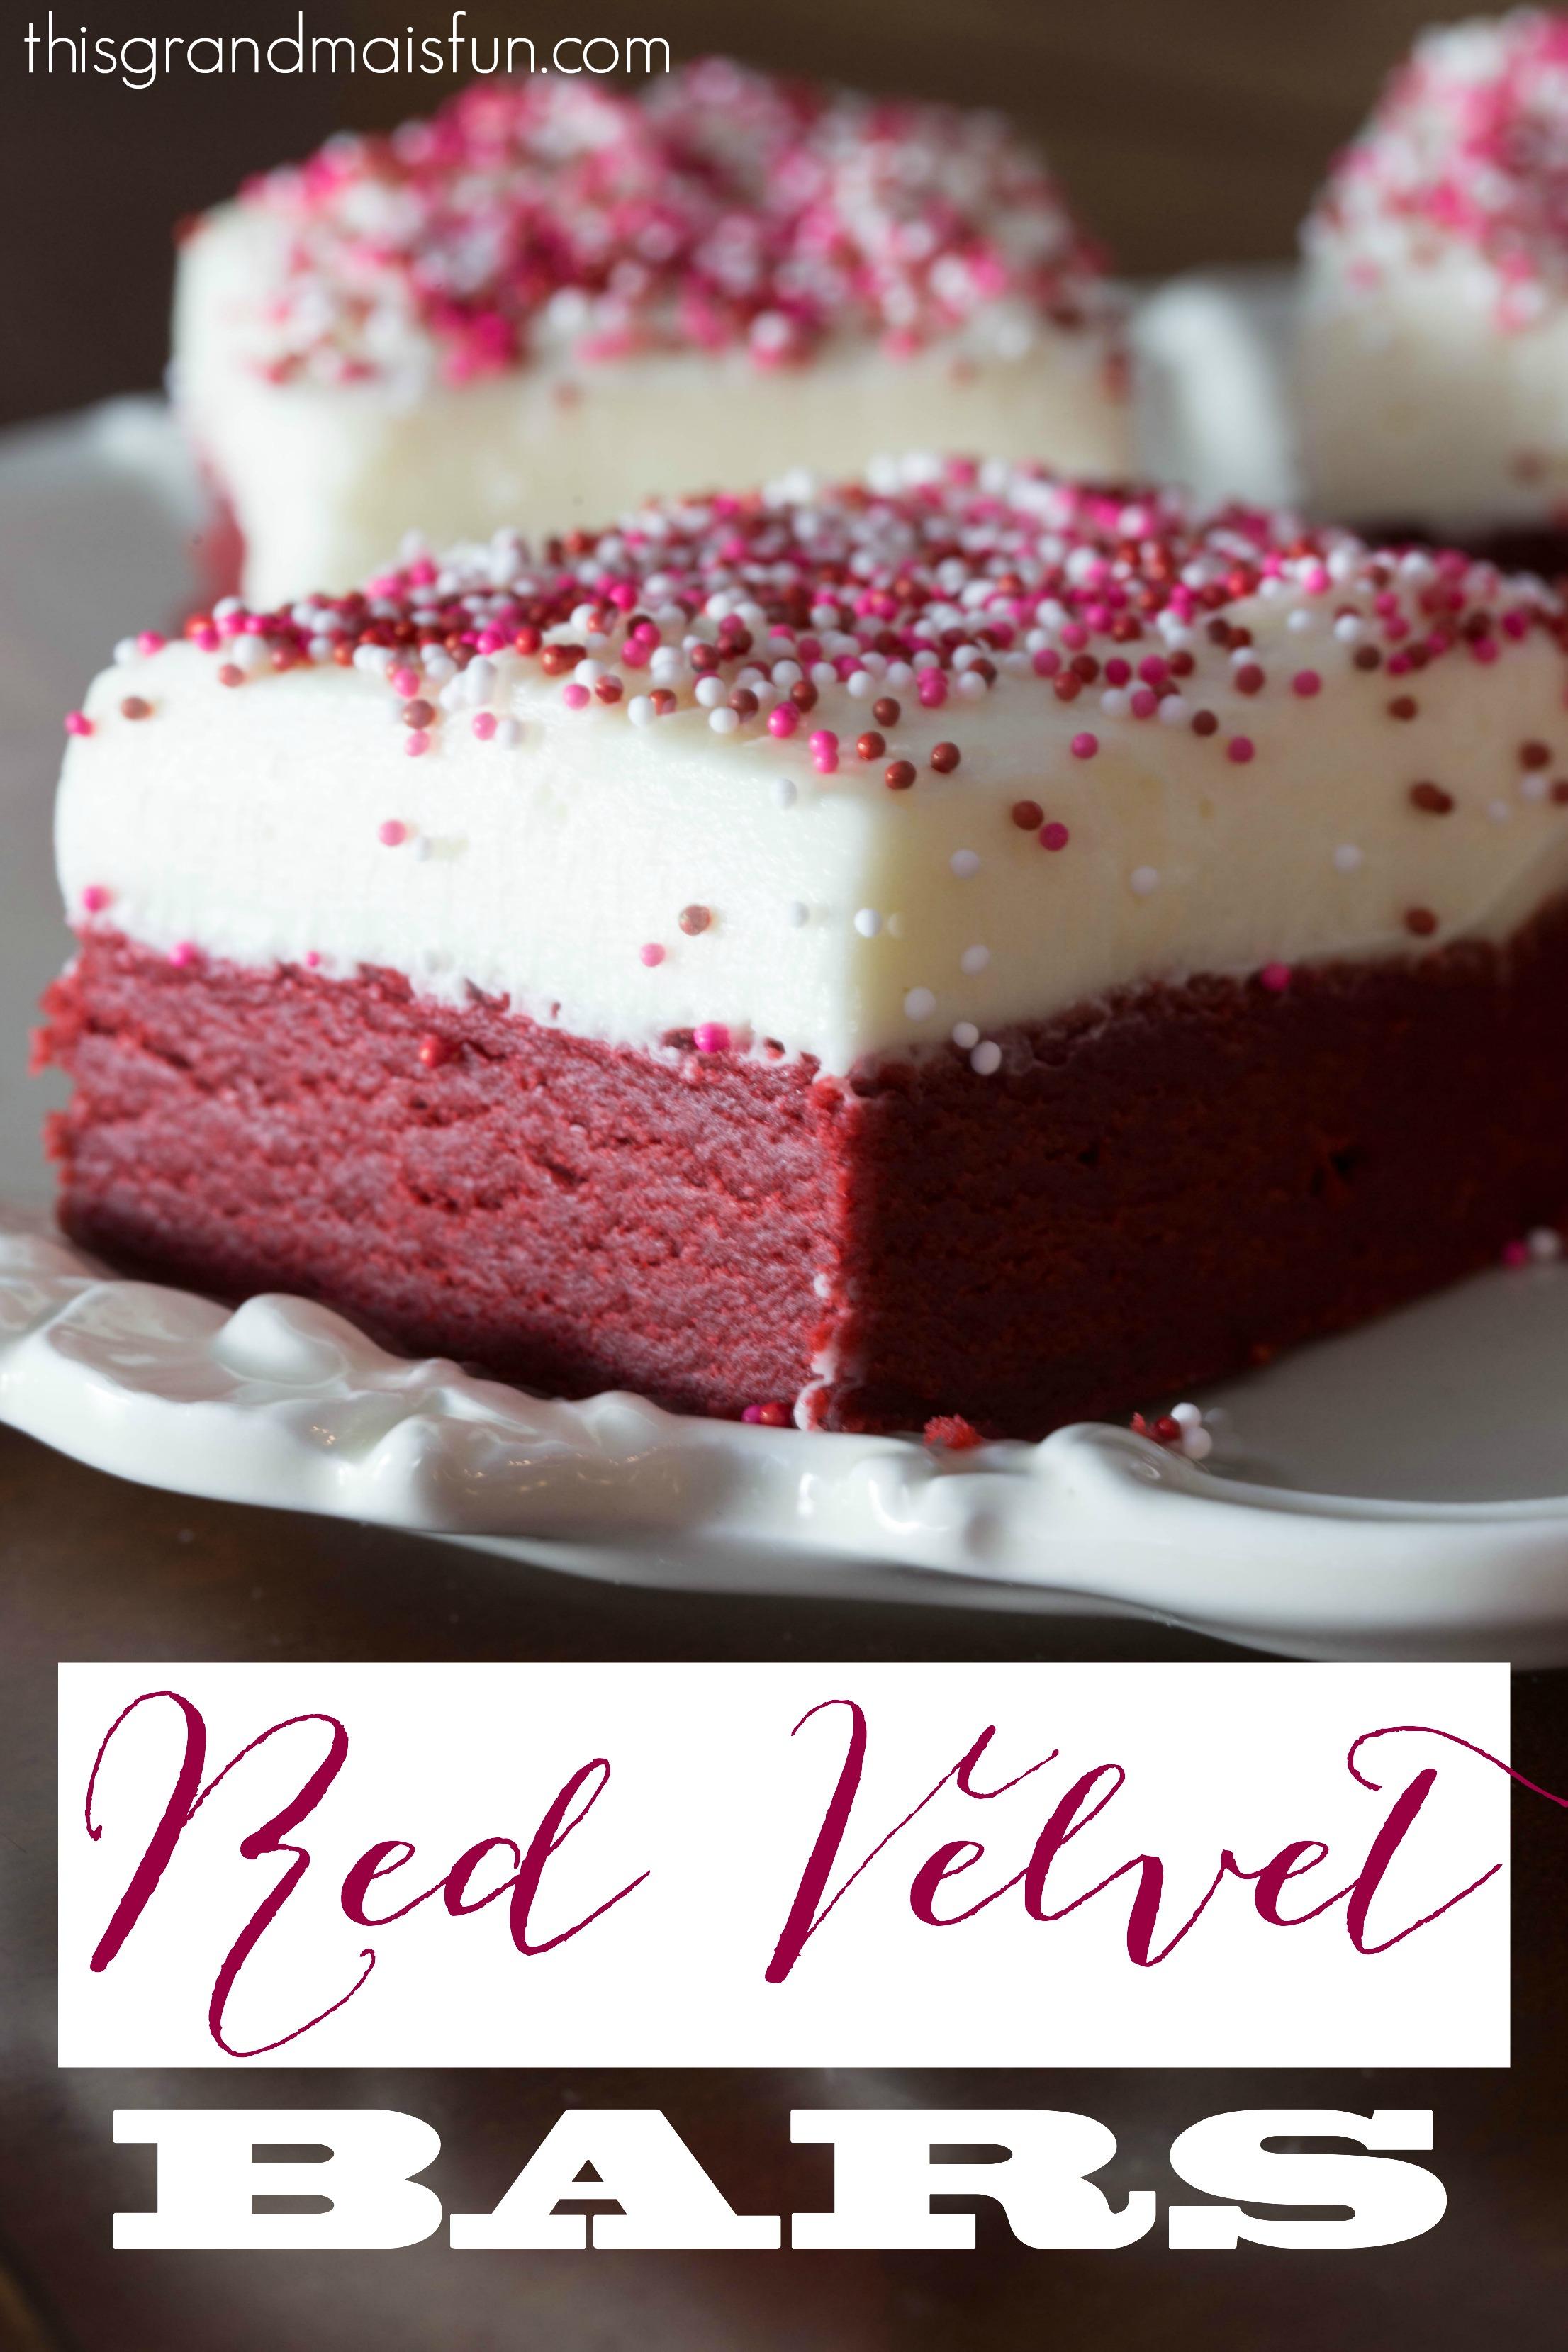 Red Velvet Bars Tgif This Grandma Is Fun